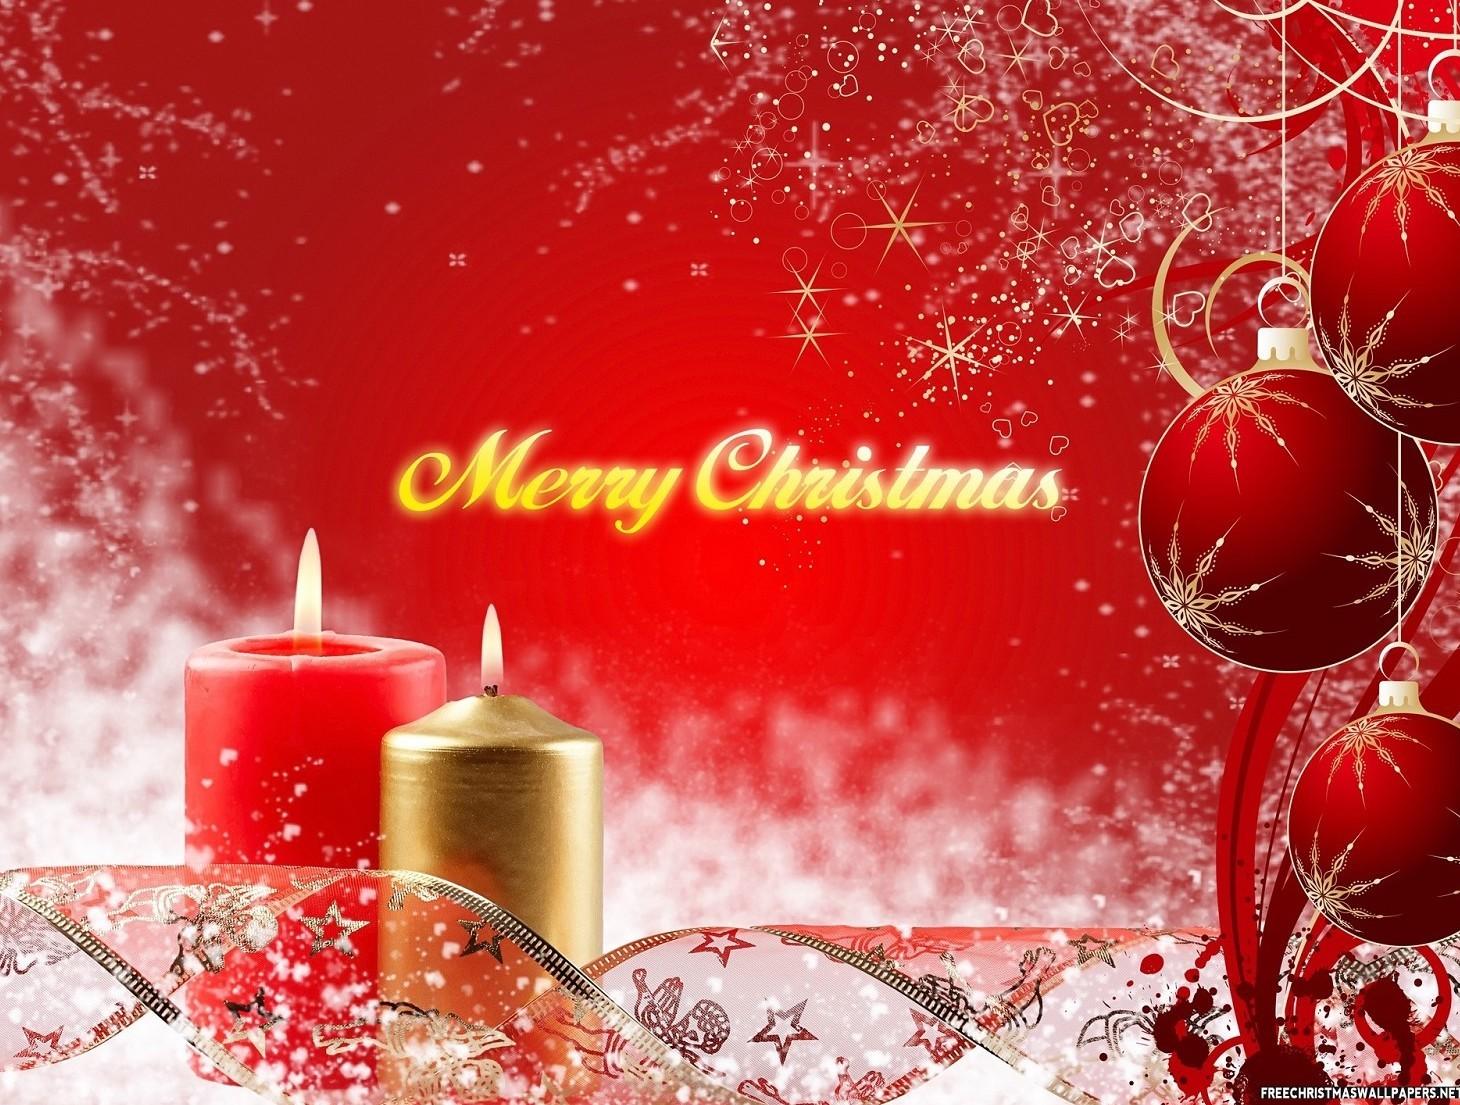 Auguri di Natale: frasi divertenti, dedi